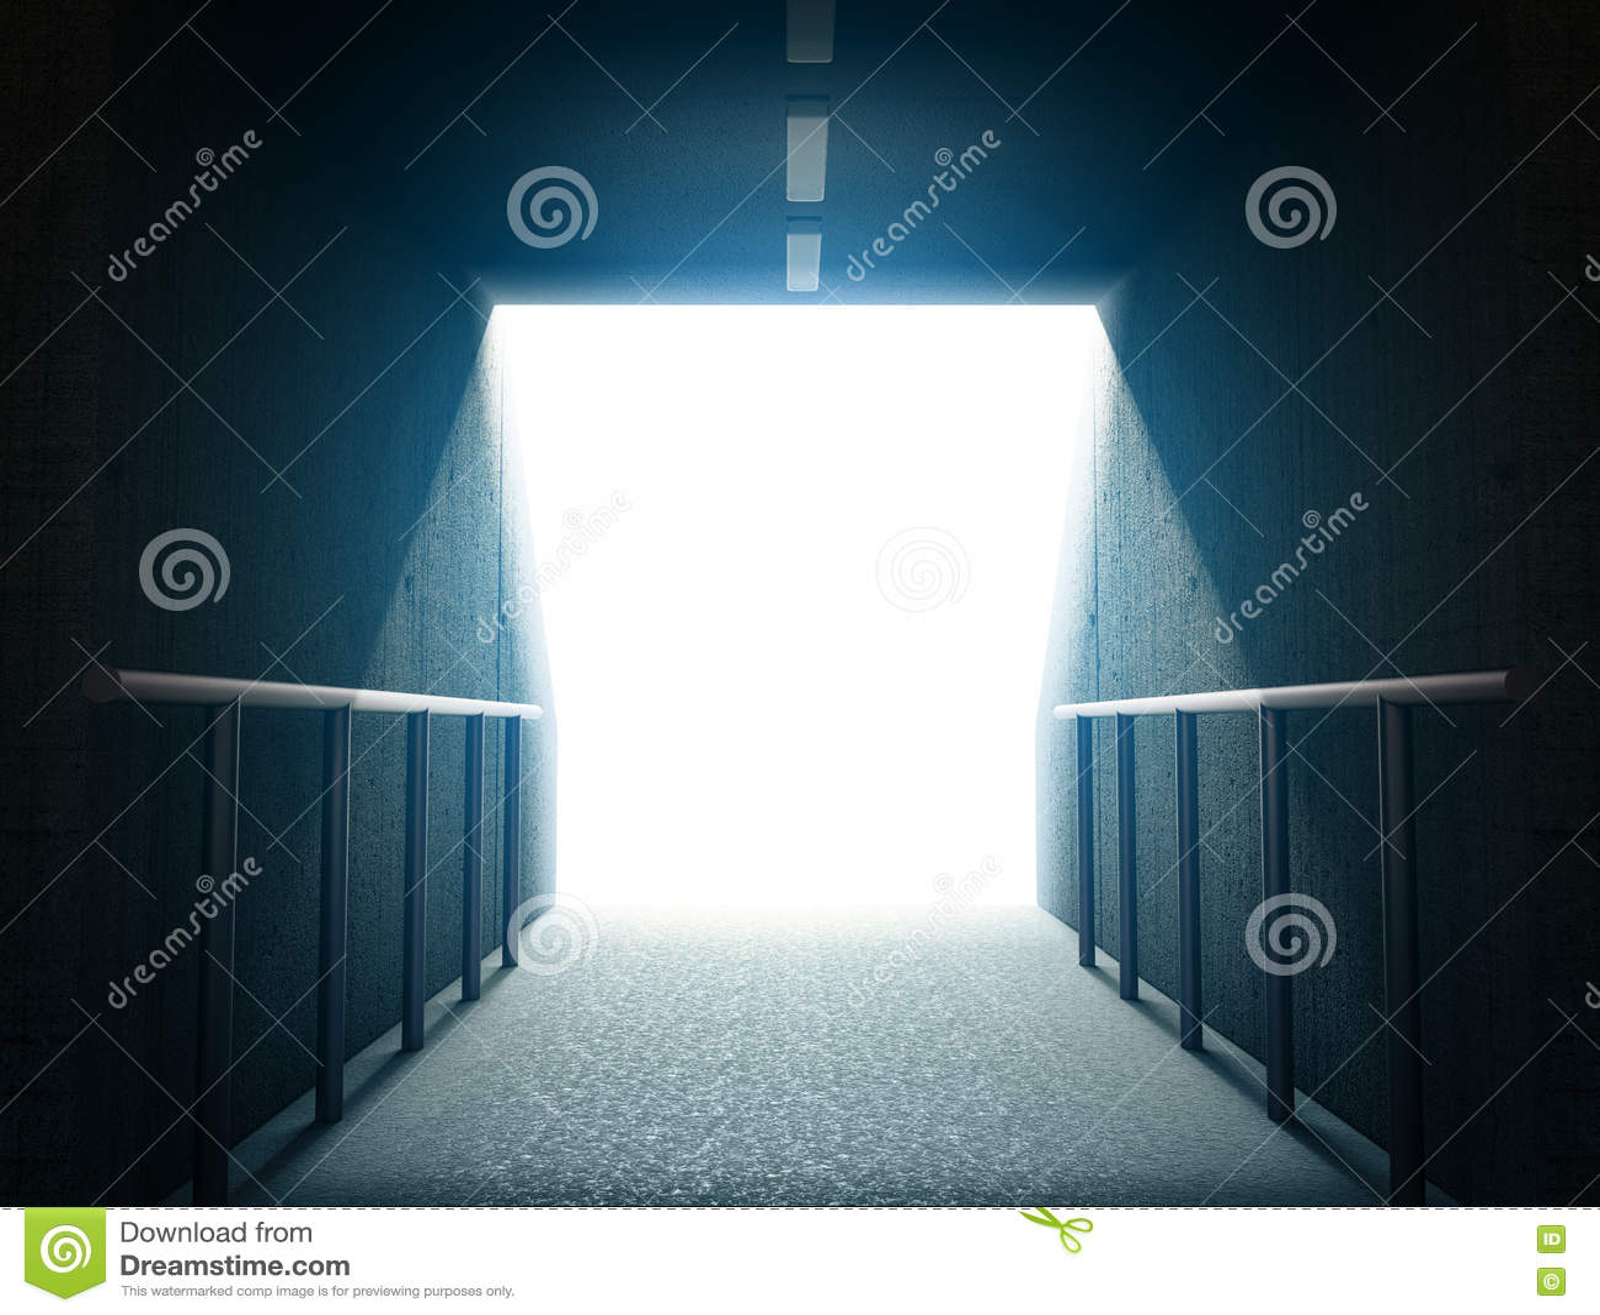 Túnel 3d de la arena